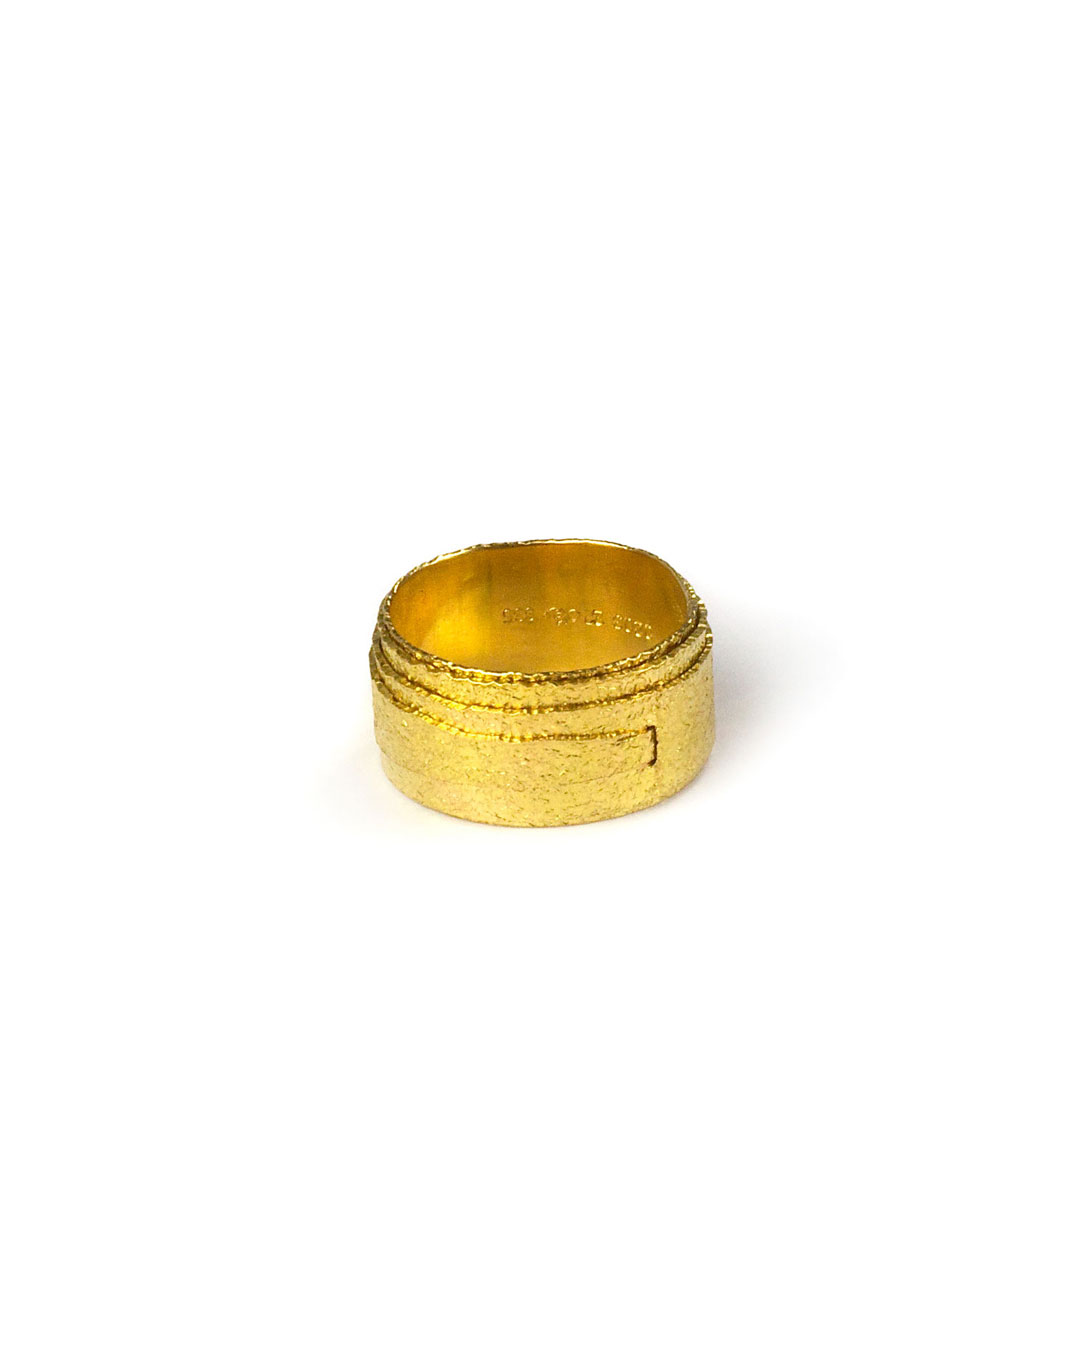 Okinari Kurokawa, untitled, 1997, ring; 20ct gold, ø 20 x 10 mm